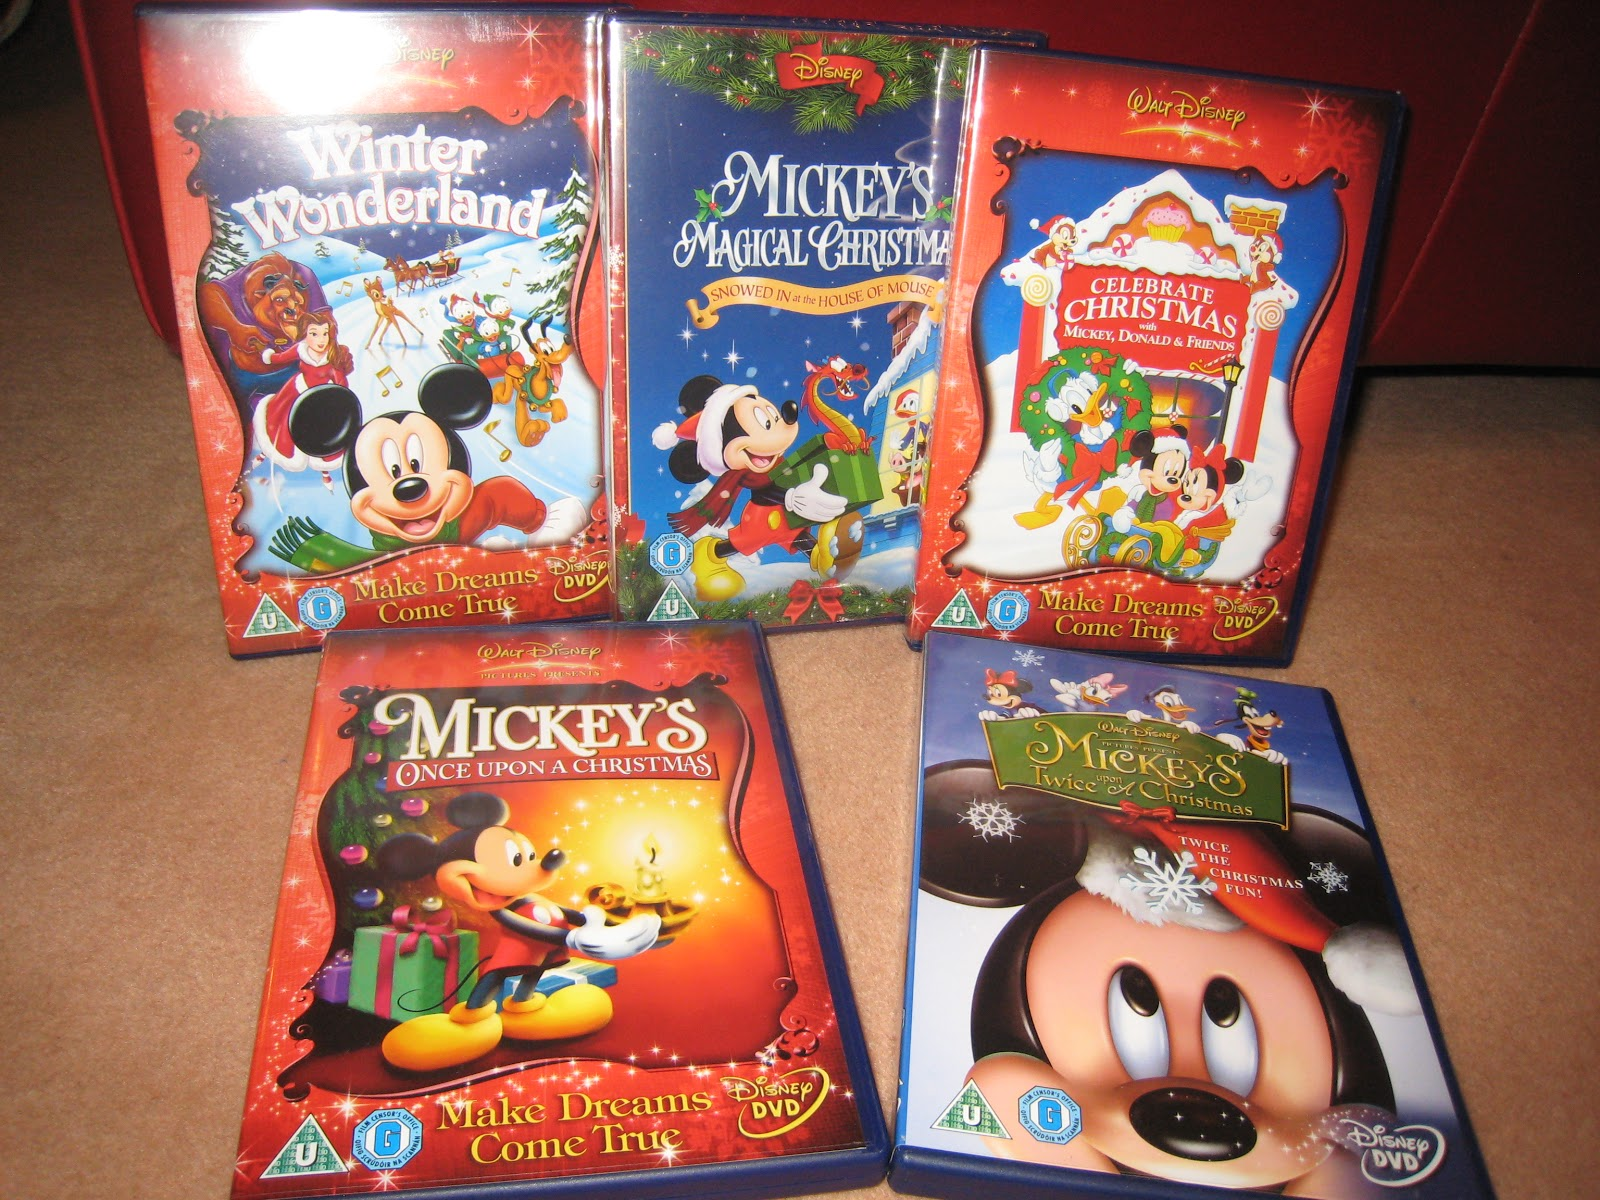 Upon Mouse Disney Dvd Twice Christmas Mickey